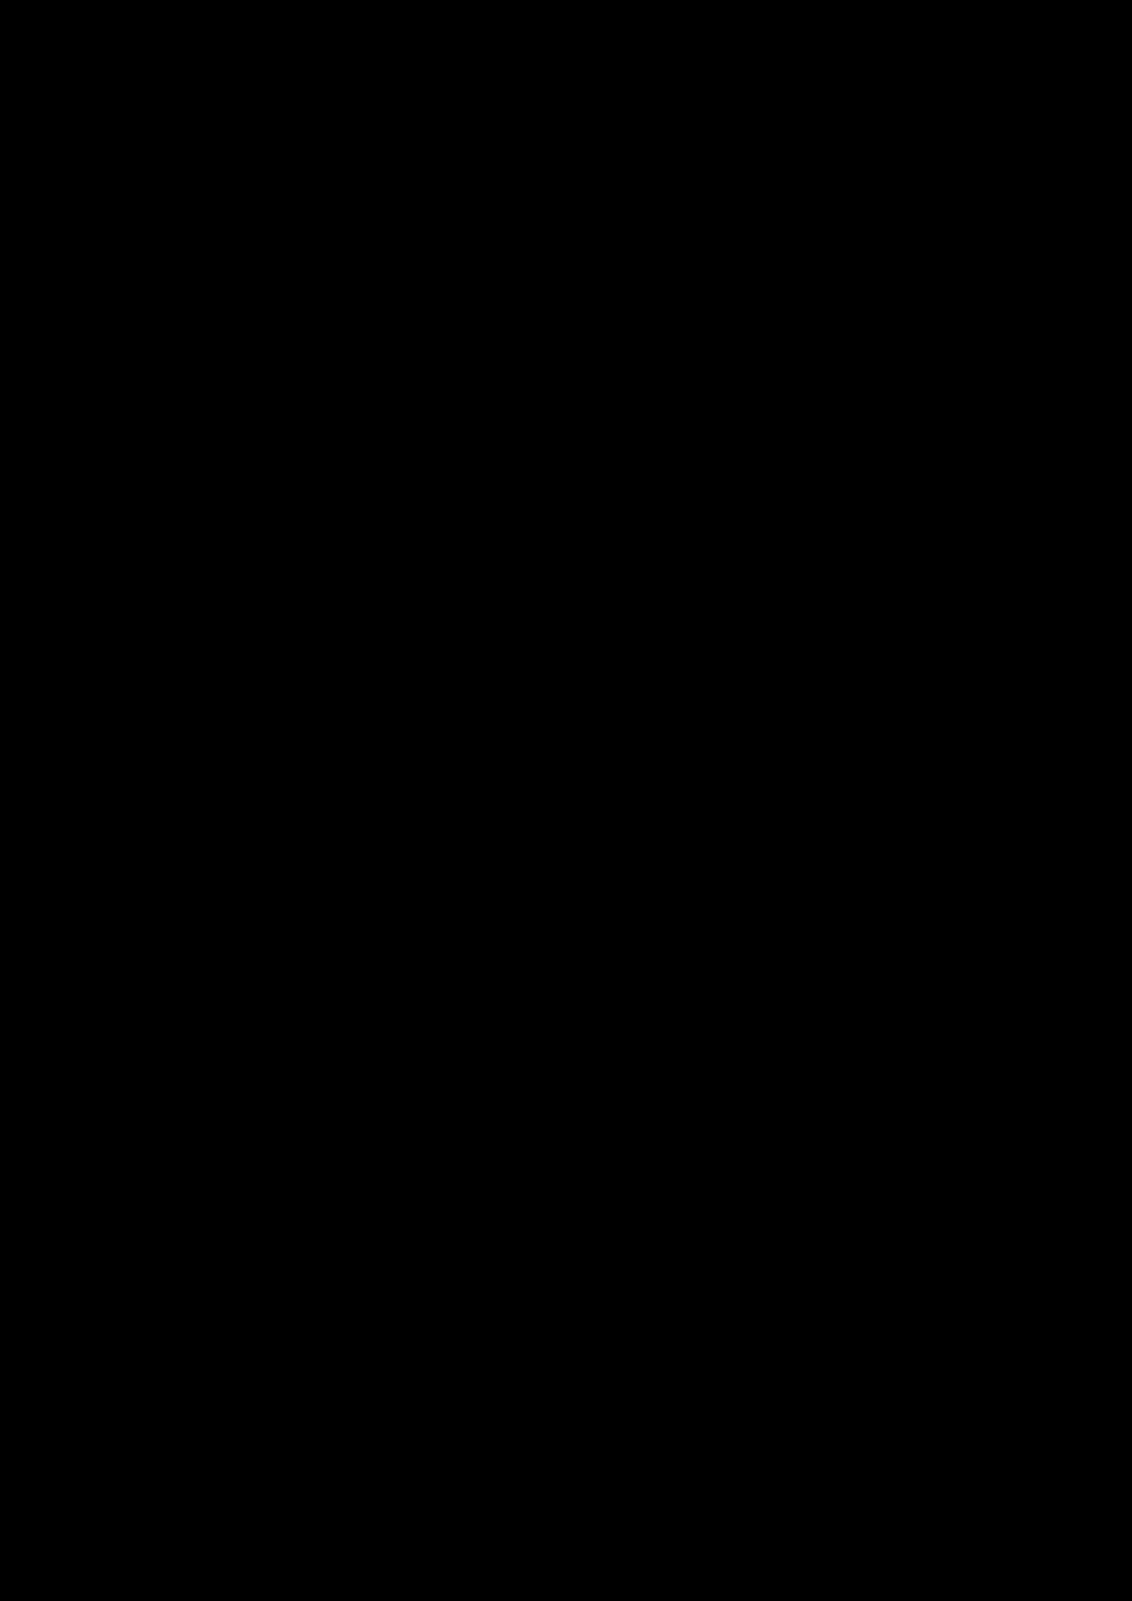 Belyiy sokol slide, Image 142